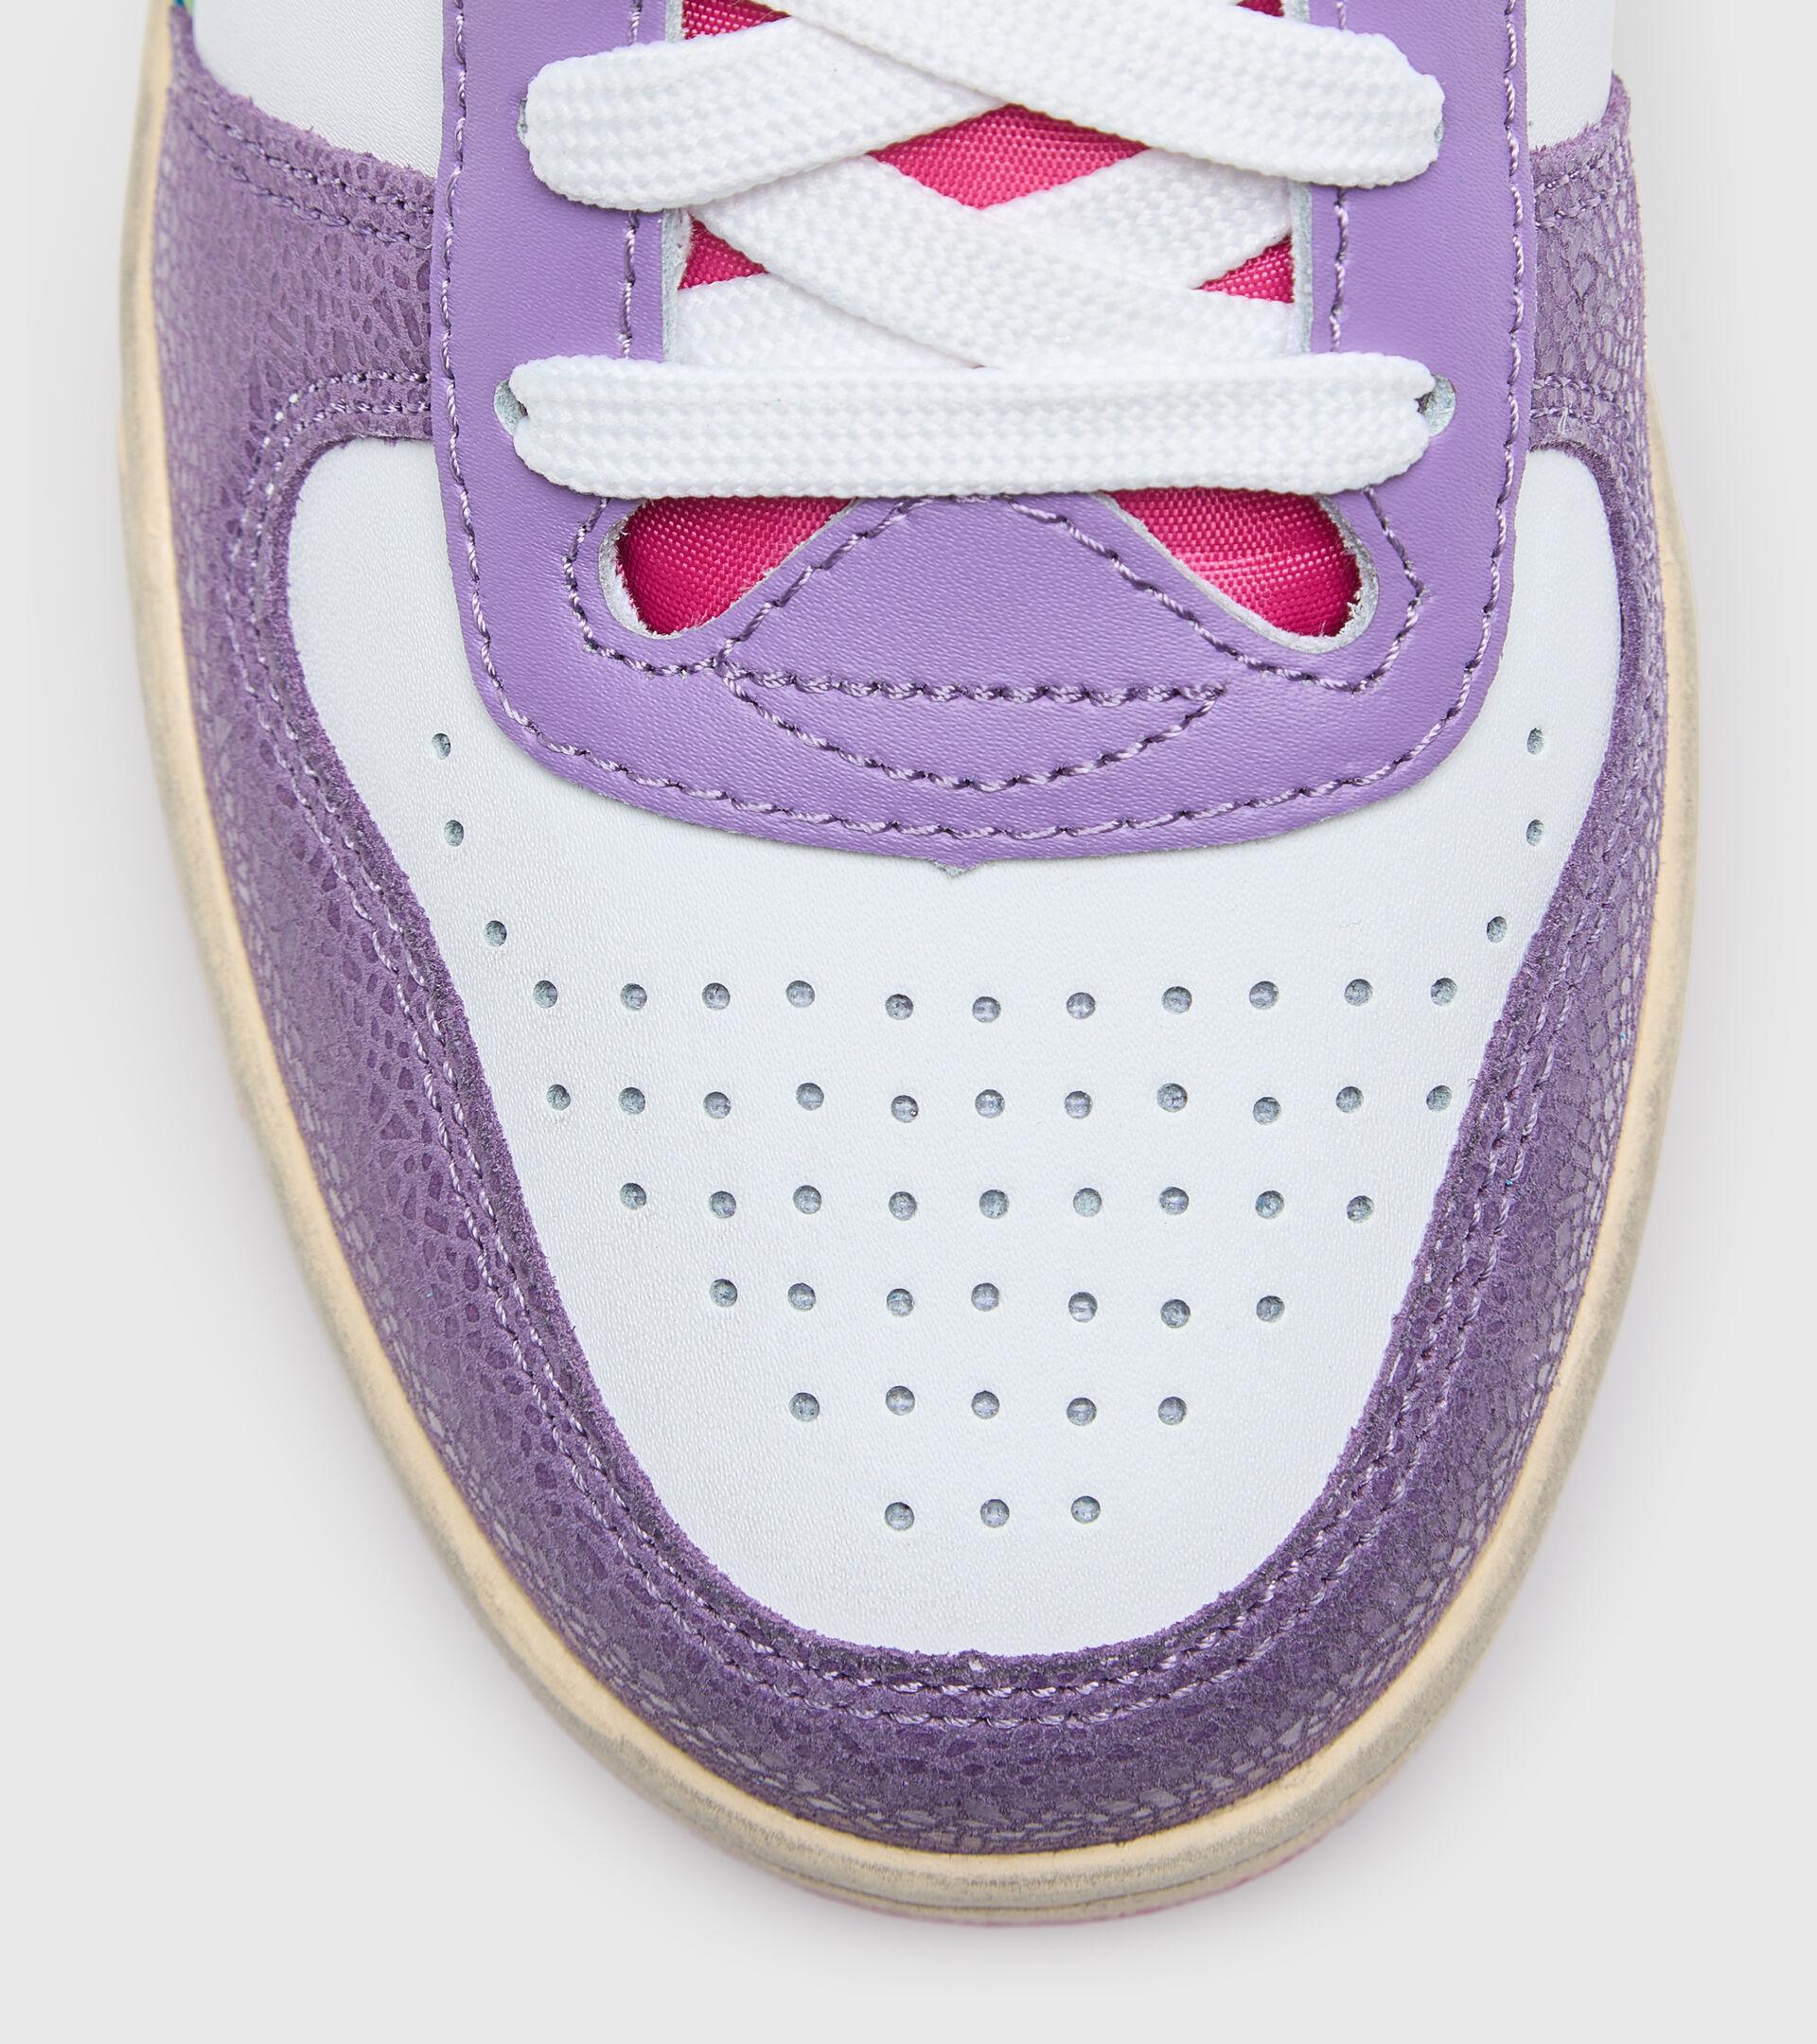 Sports shoe - Women MAGIC BASKET LOW ICONA WN ENGLISH LAVENDER/WHITE - Diadora